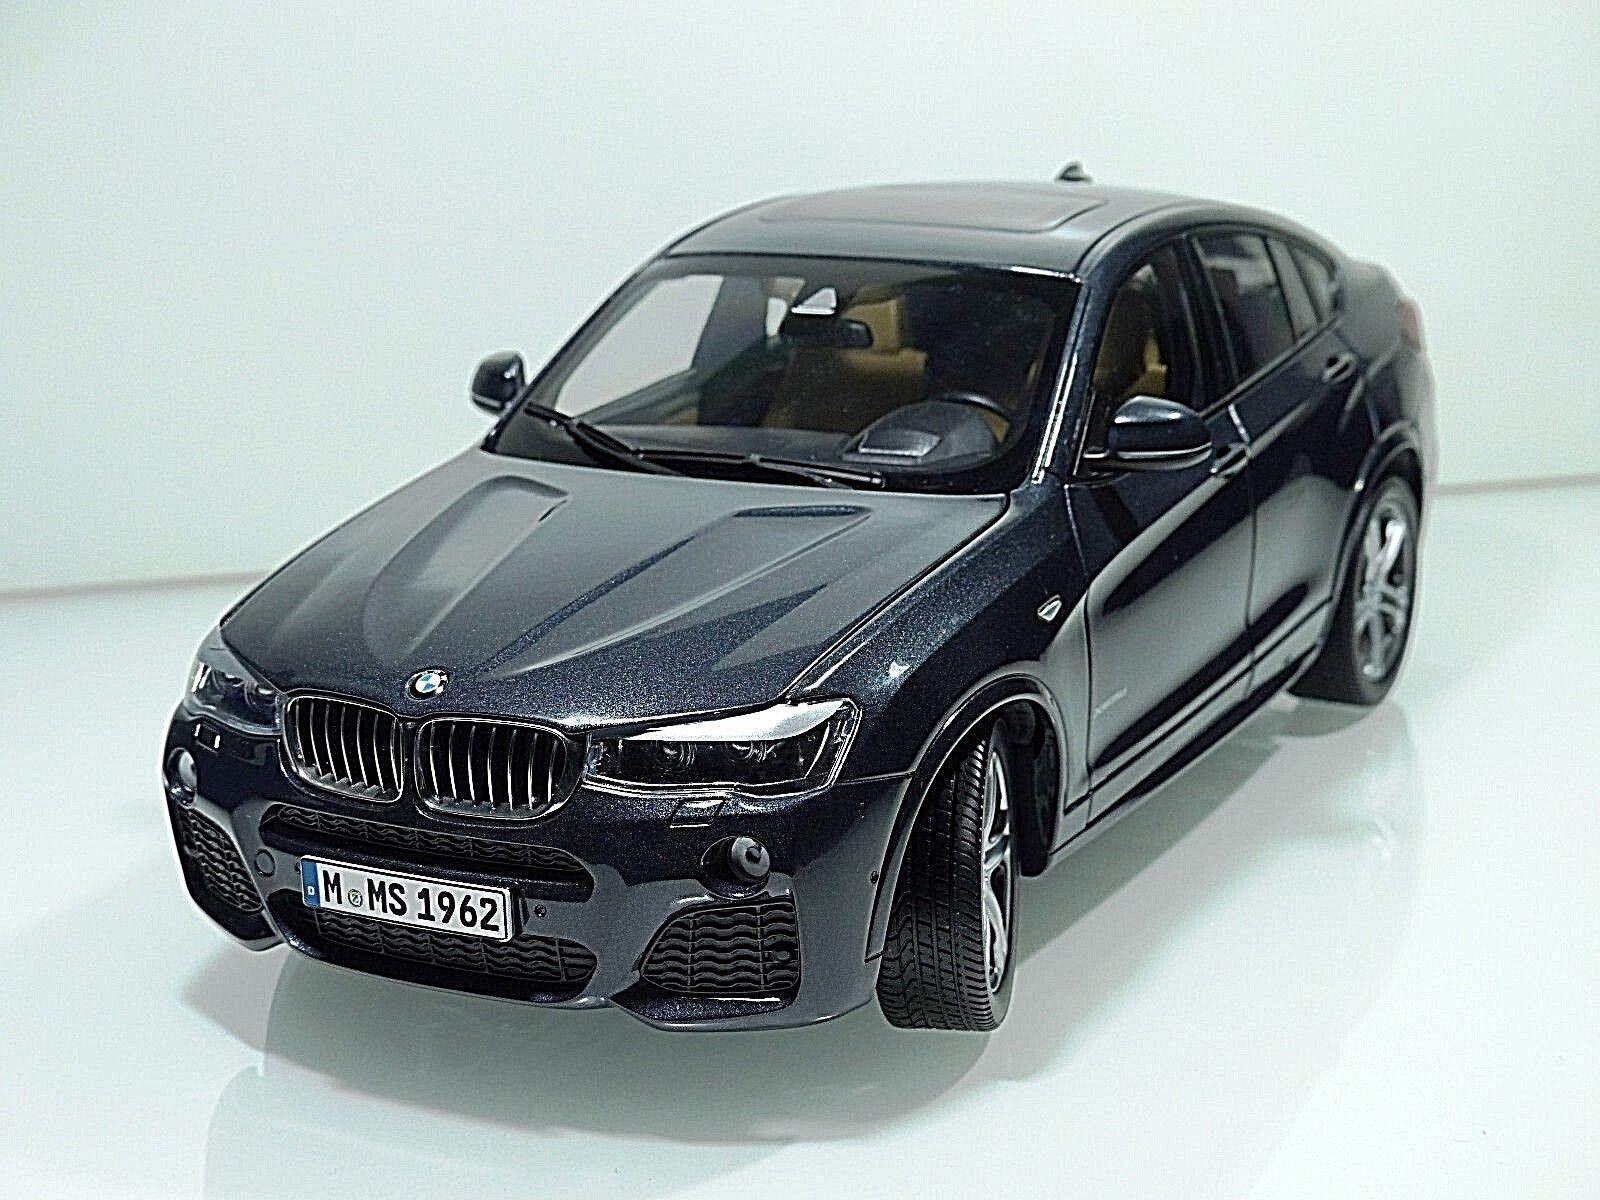 BMW X4 (F26) Baujahr 2014 sophisto grey Paragon Models 1 18